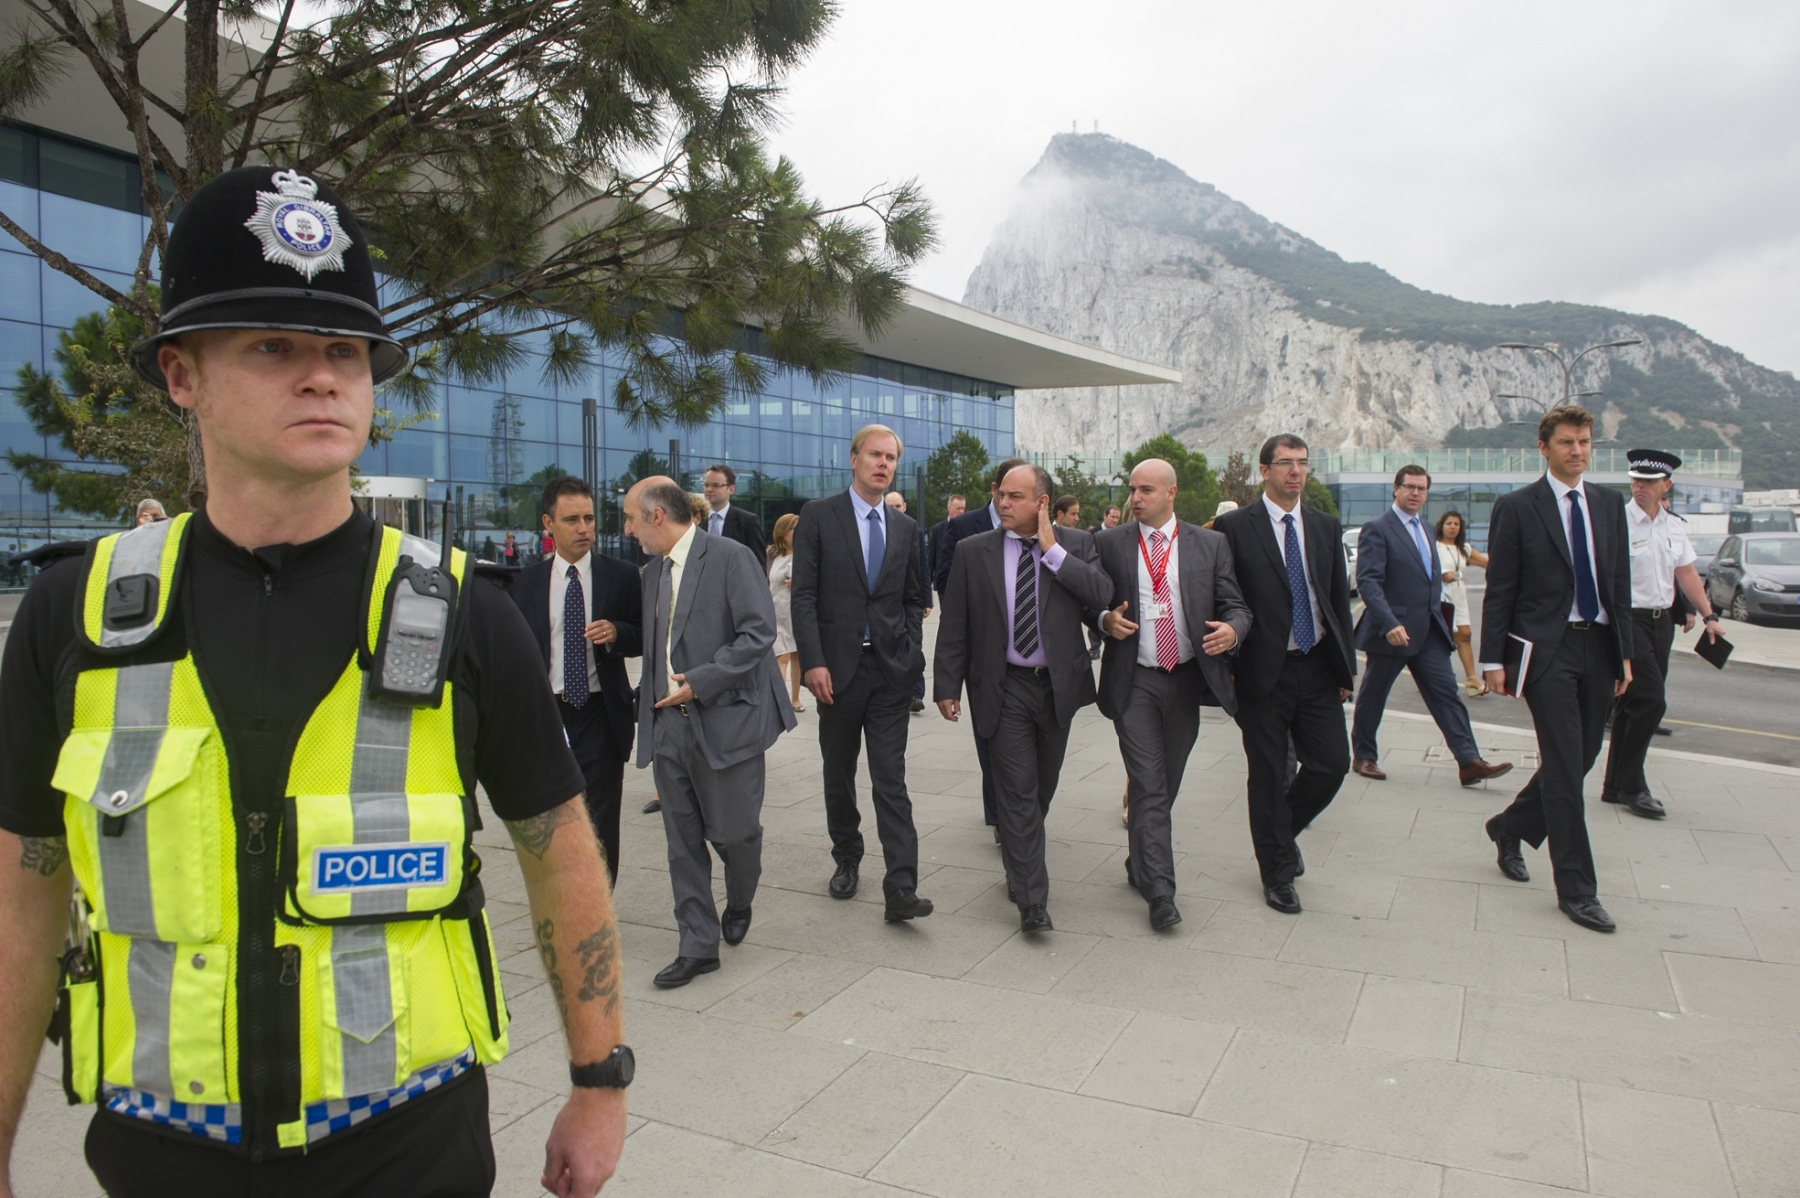 Gibraltar, 25 septiembre 2013. Miembros de la Comisión Europea se dirigen a la frontera junto a miembros de la aduana gibraltareña. MARCOS MORENO